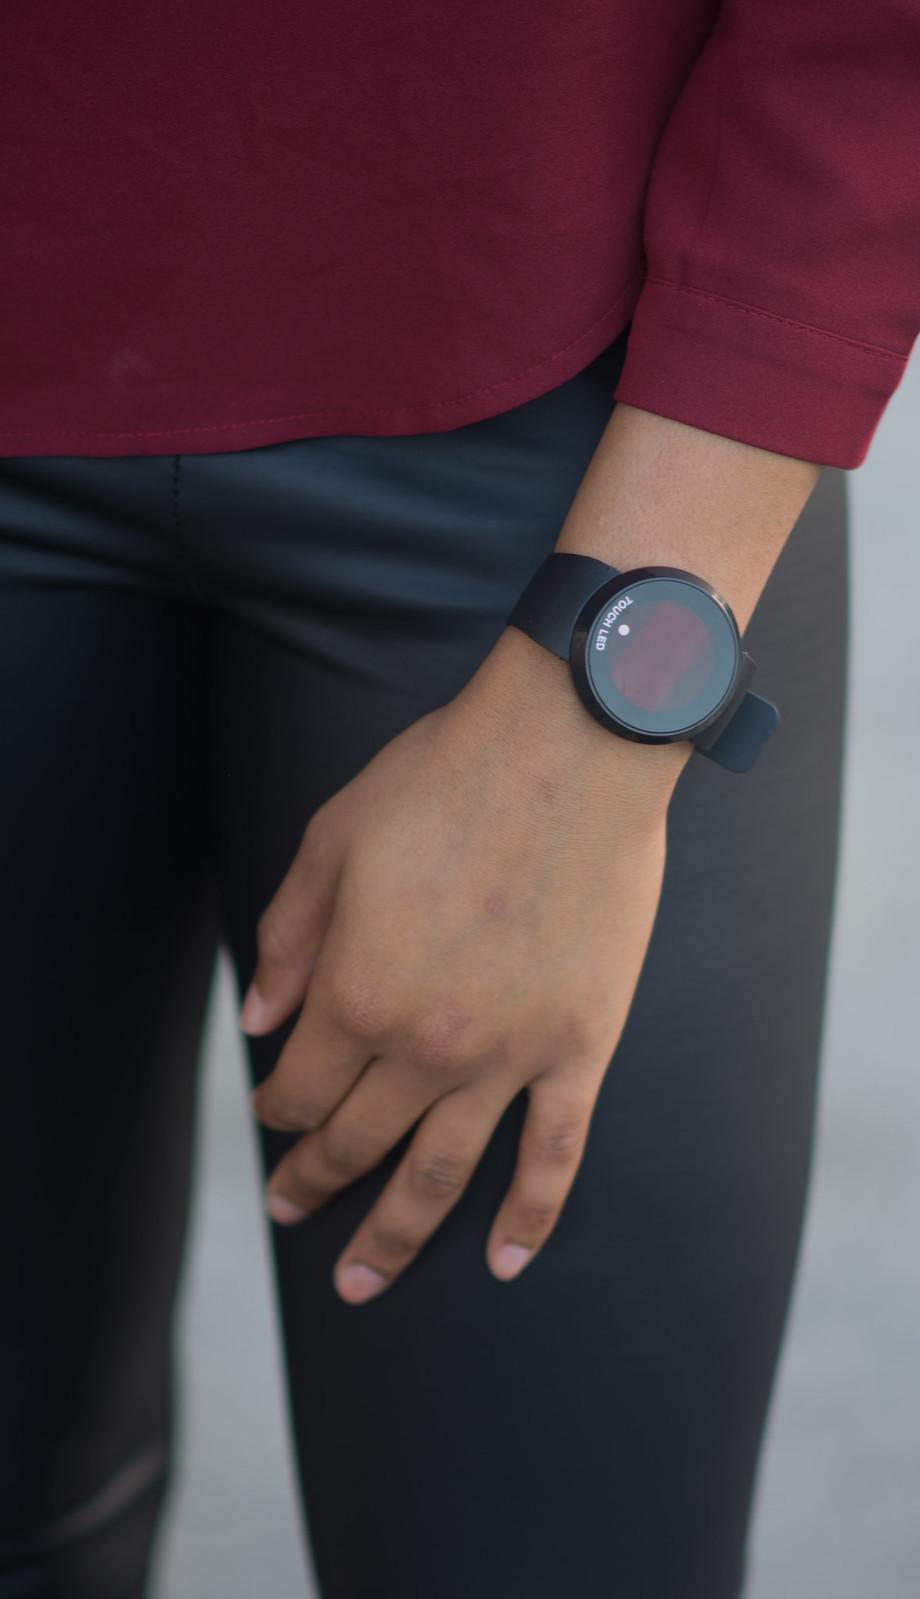 touch screen watch minimalist blogger